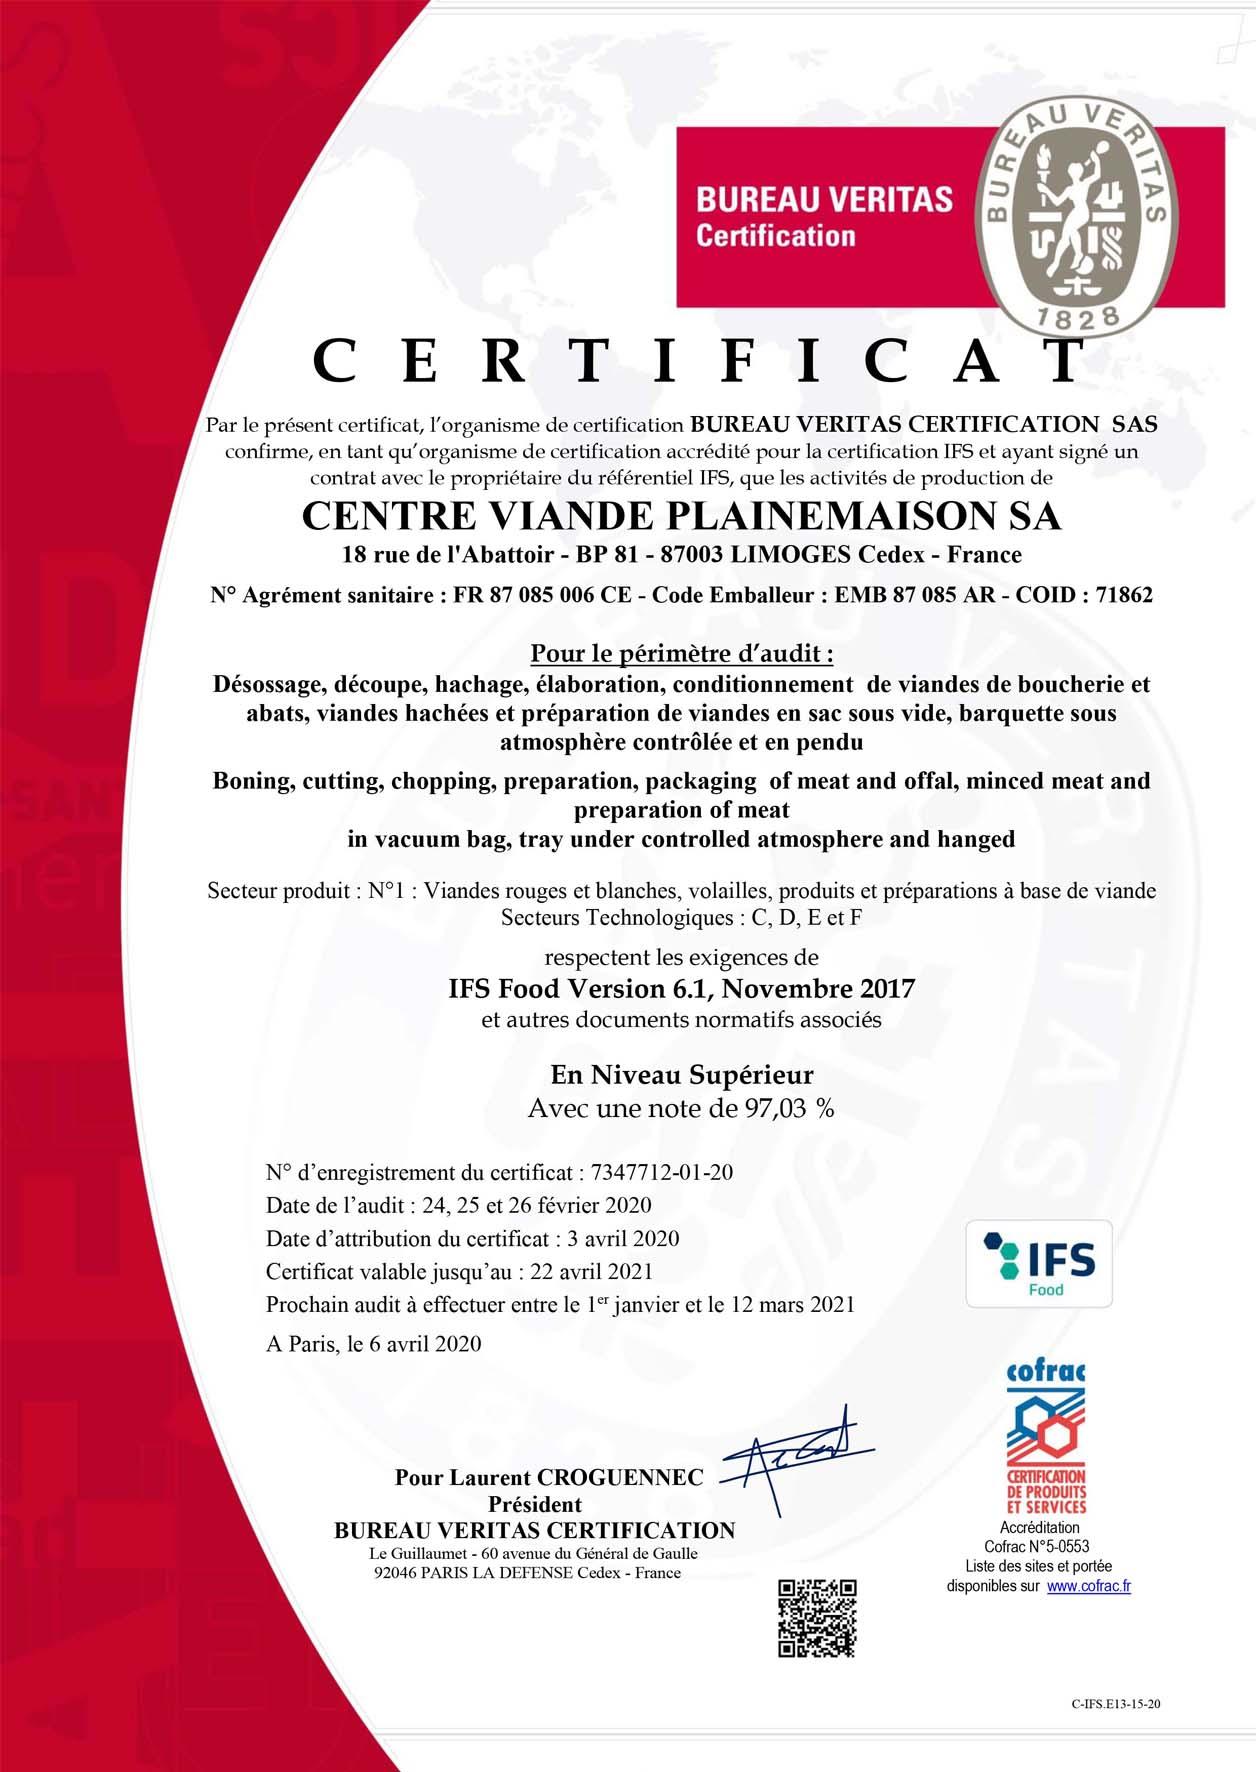 New IFS certification for CV Plainemaison